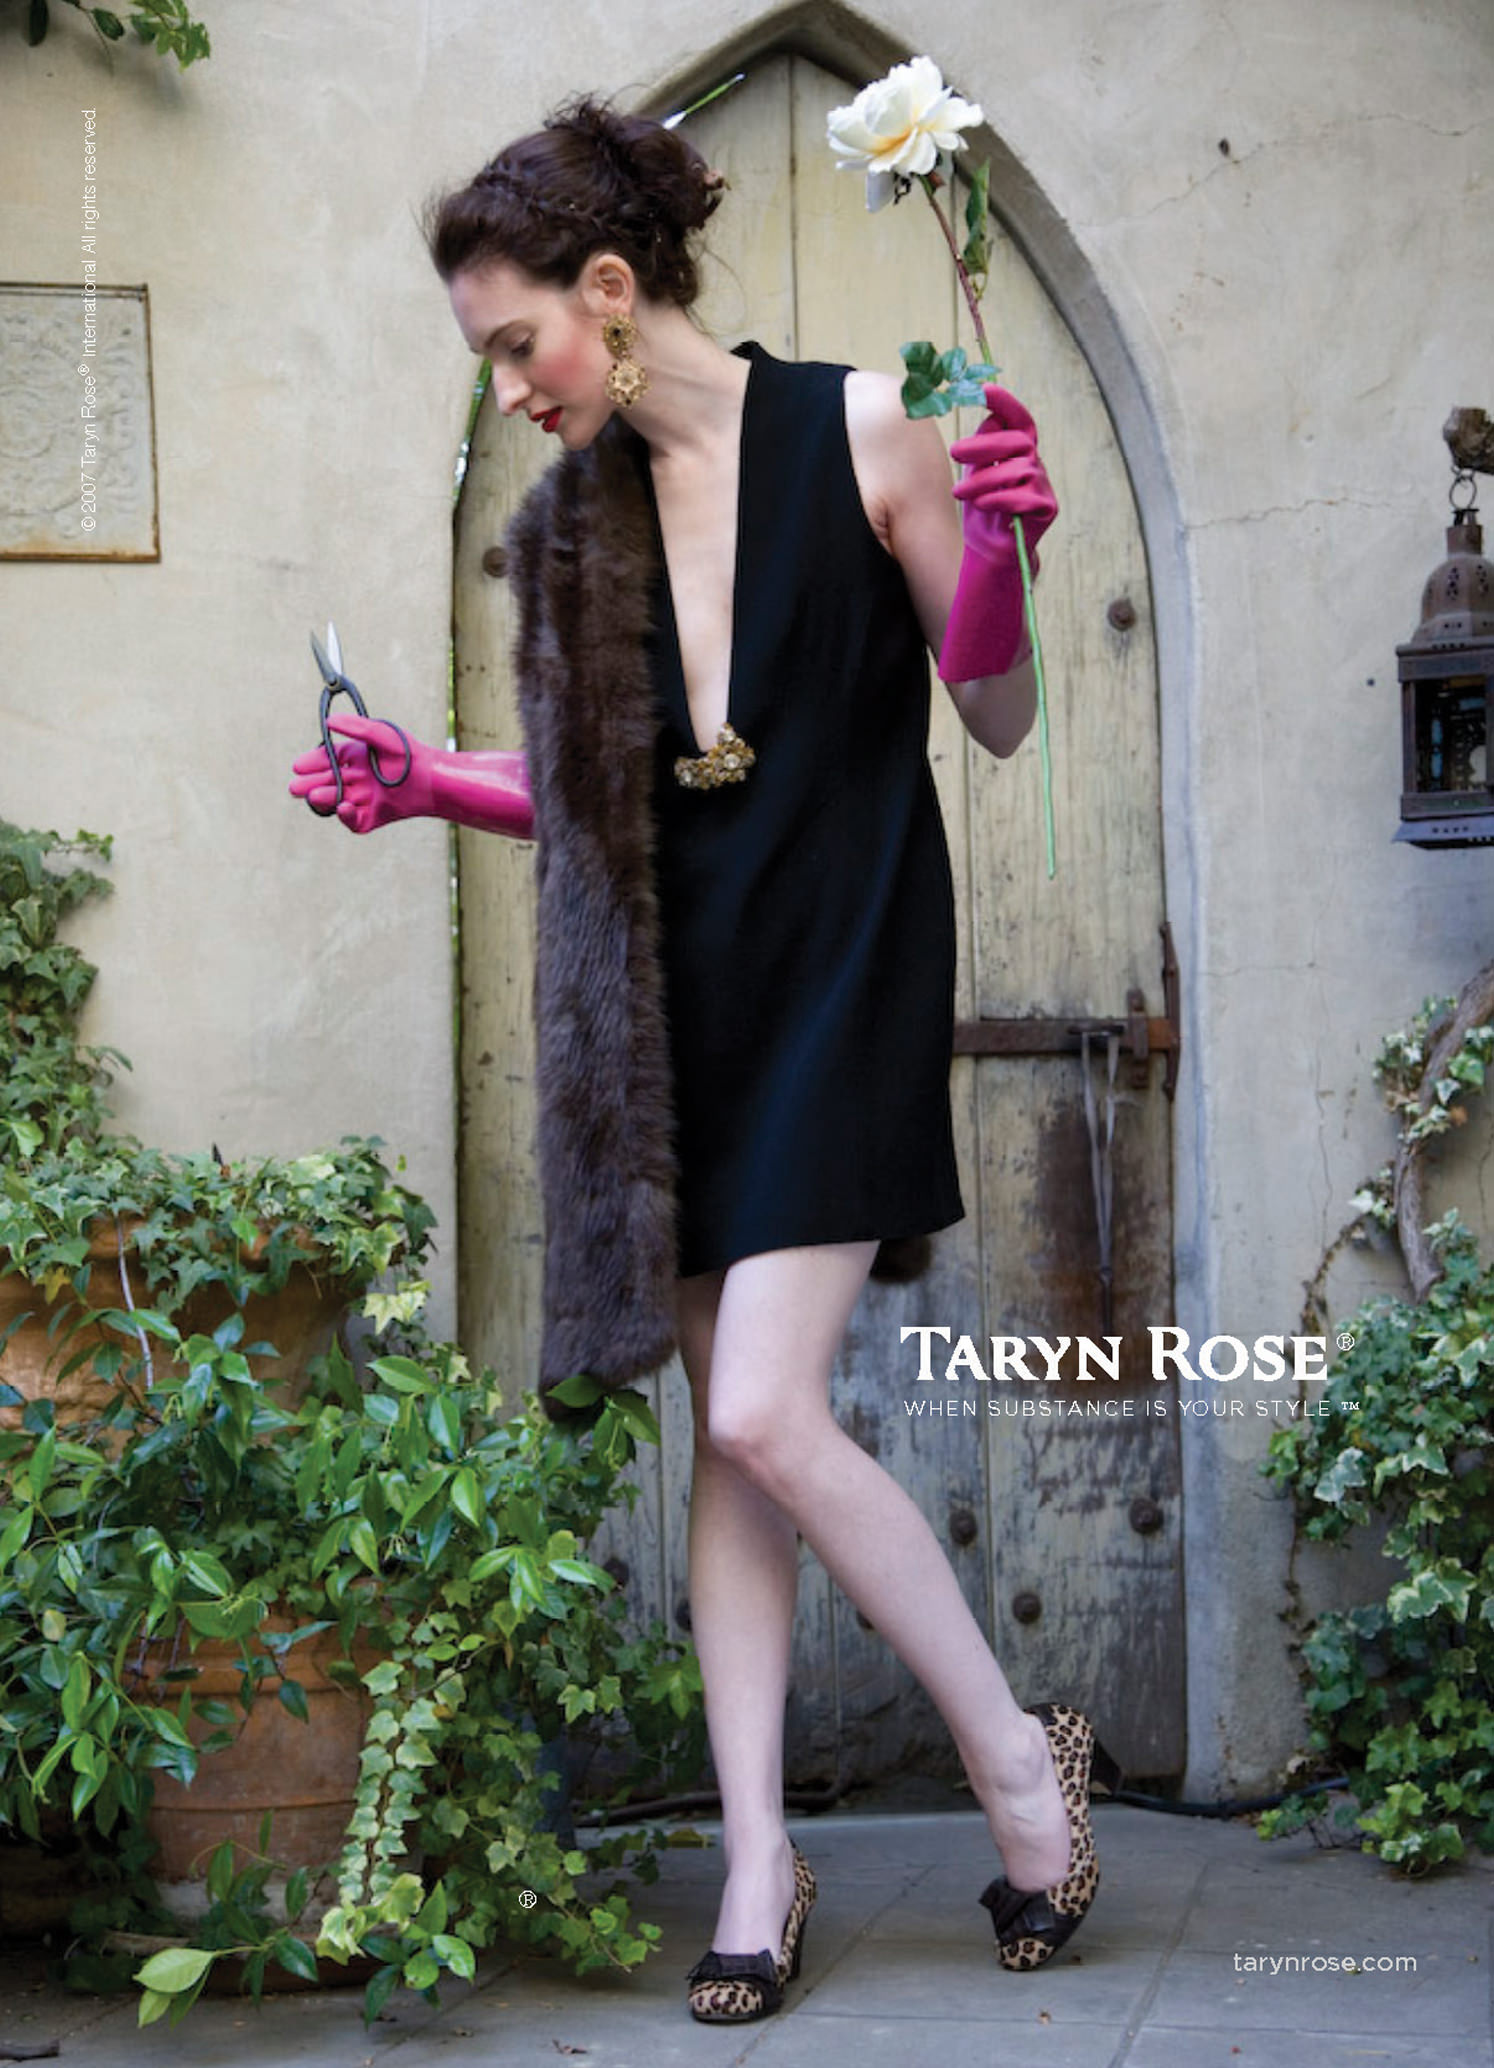 Taryn_Rose_Shoes_poster__premium_line_Pink_Gloves.jpg